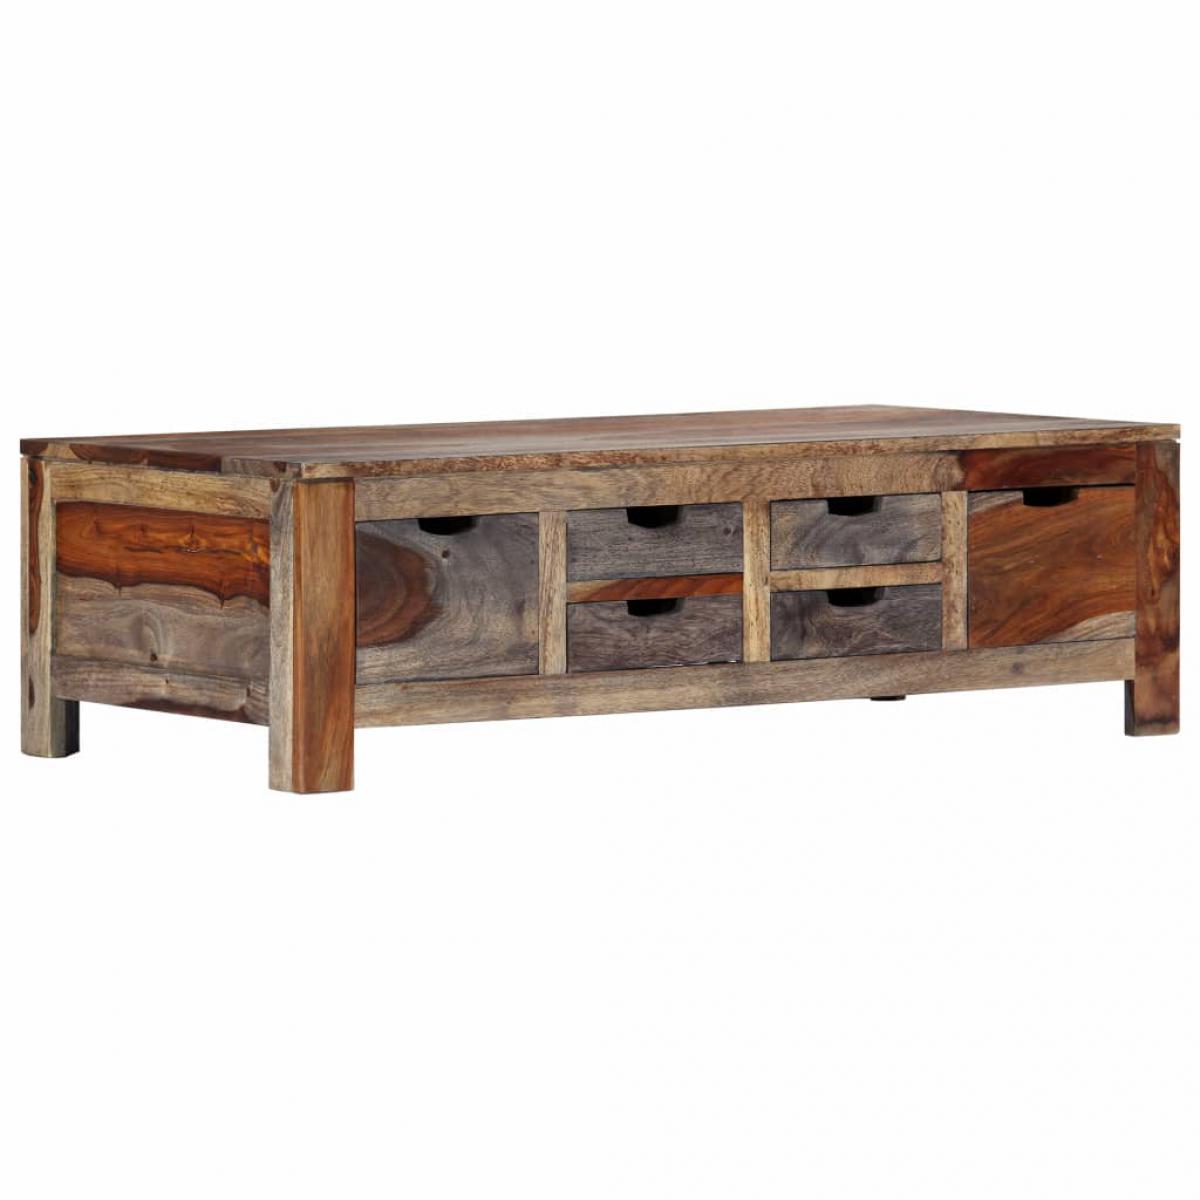 Chunhelife Table basse Gris 100 x 55 x 30 cm Bois de Sesham massif